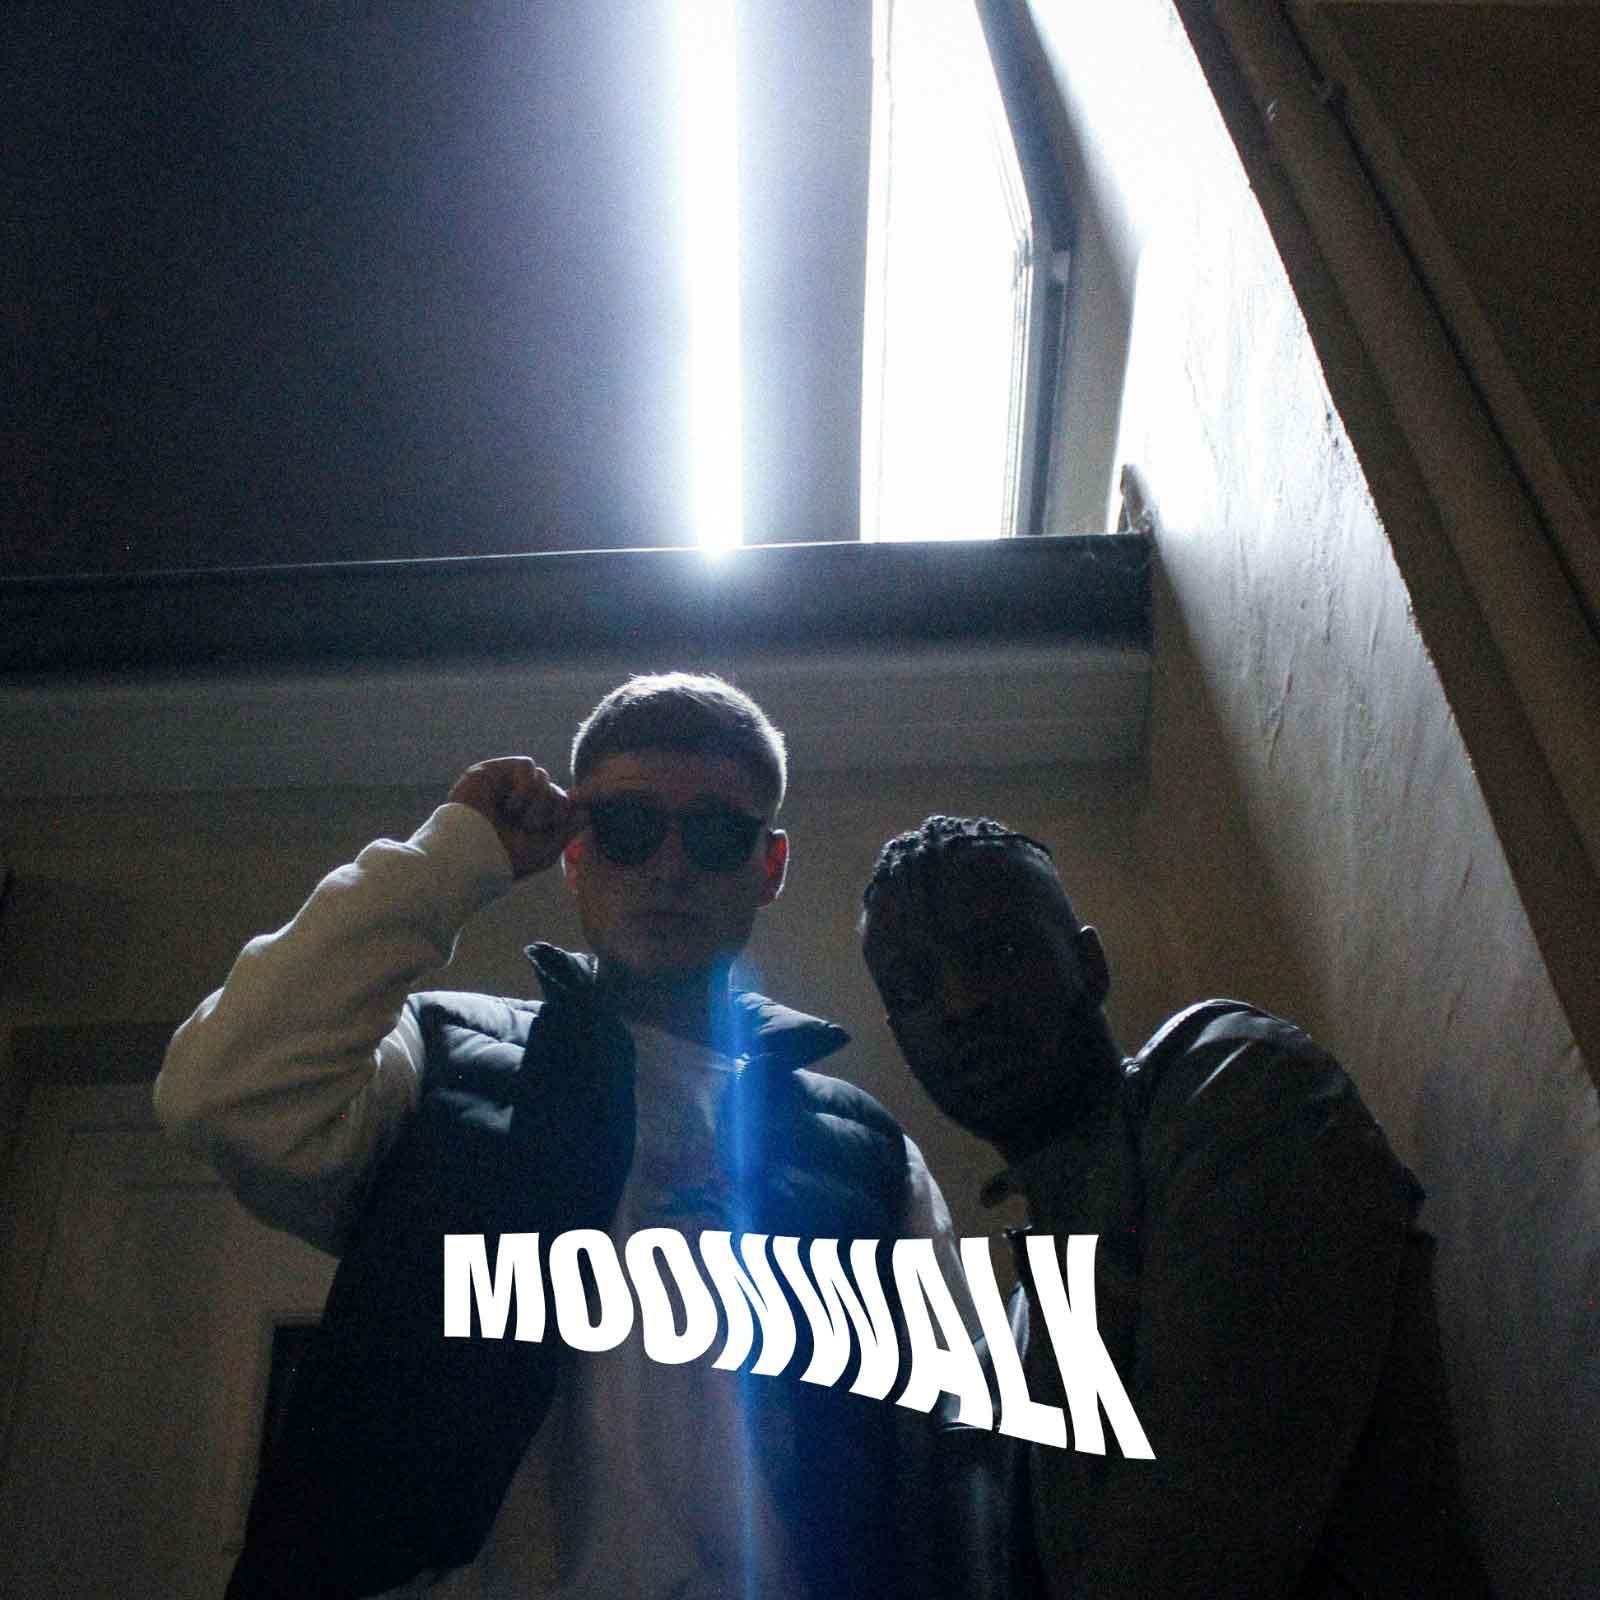 Upcoming: Jibbo, Múrph - Moonwalk